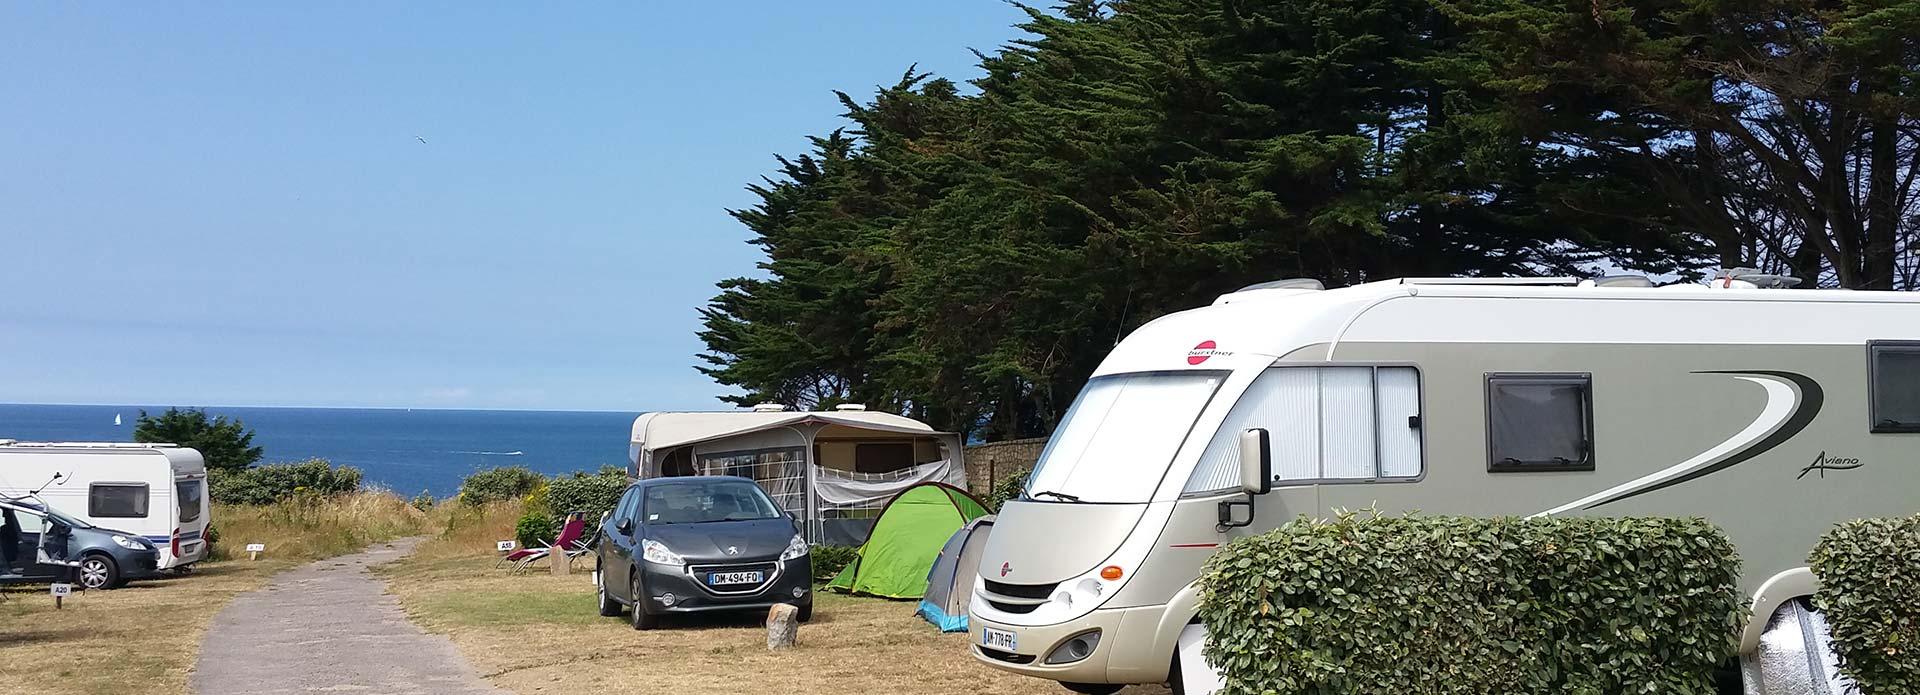 location dans camping calme